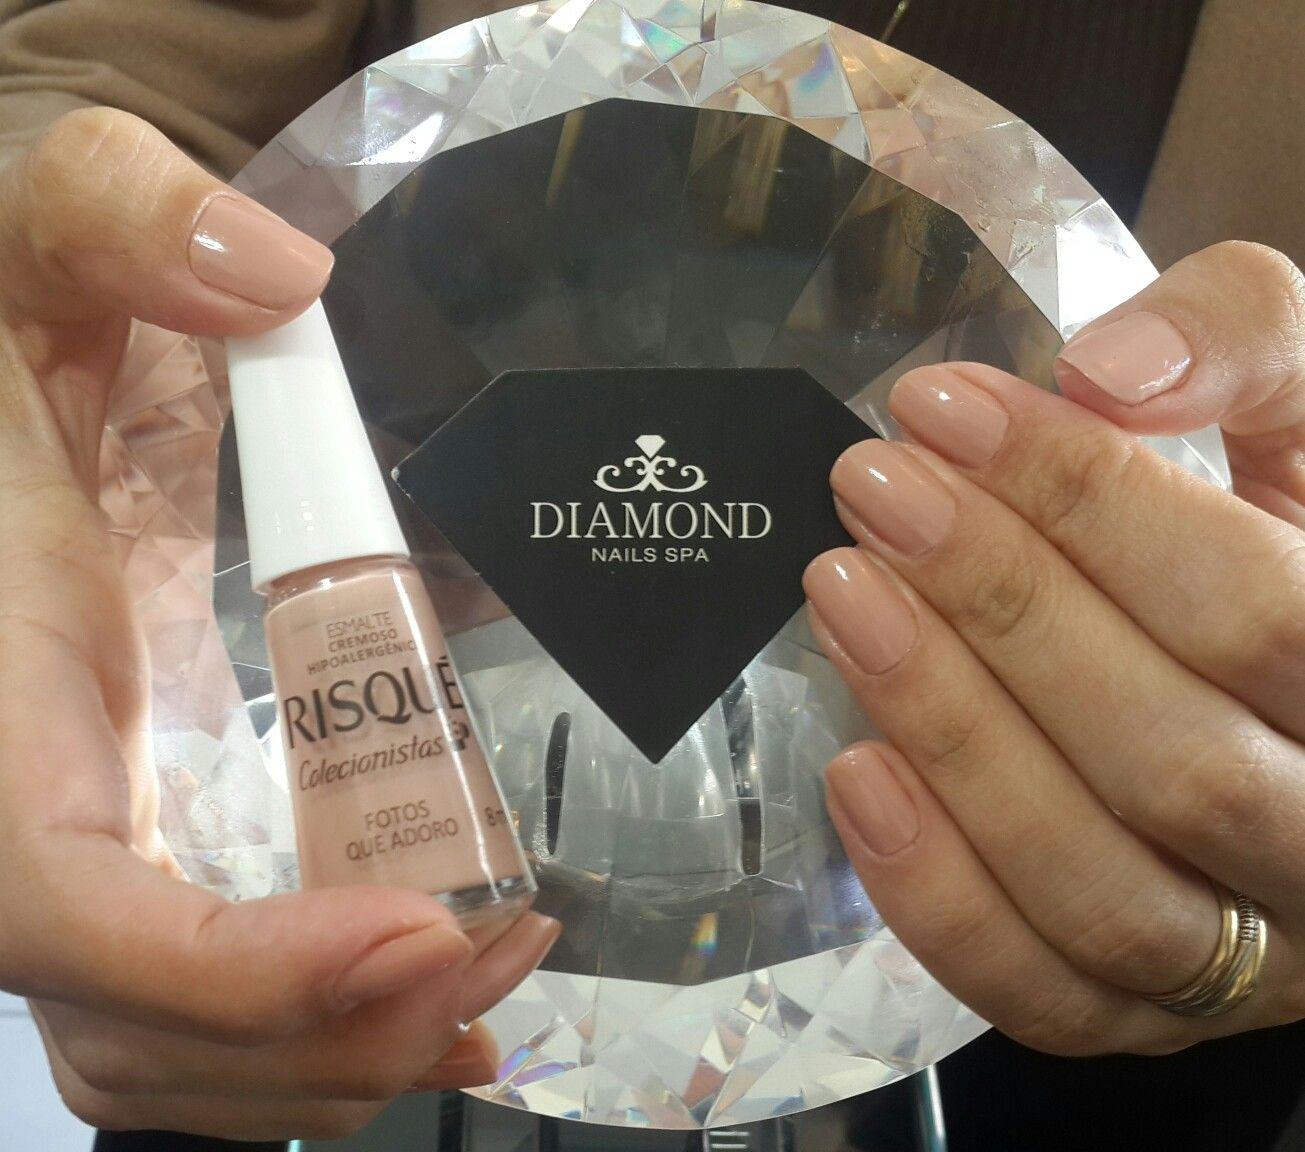 diamondnailsspa #novacolecao #novosnudesrisqué @licelys | Nails ...